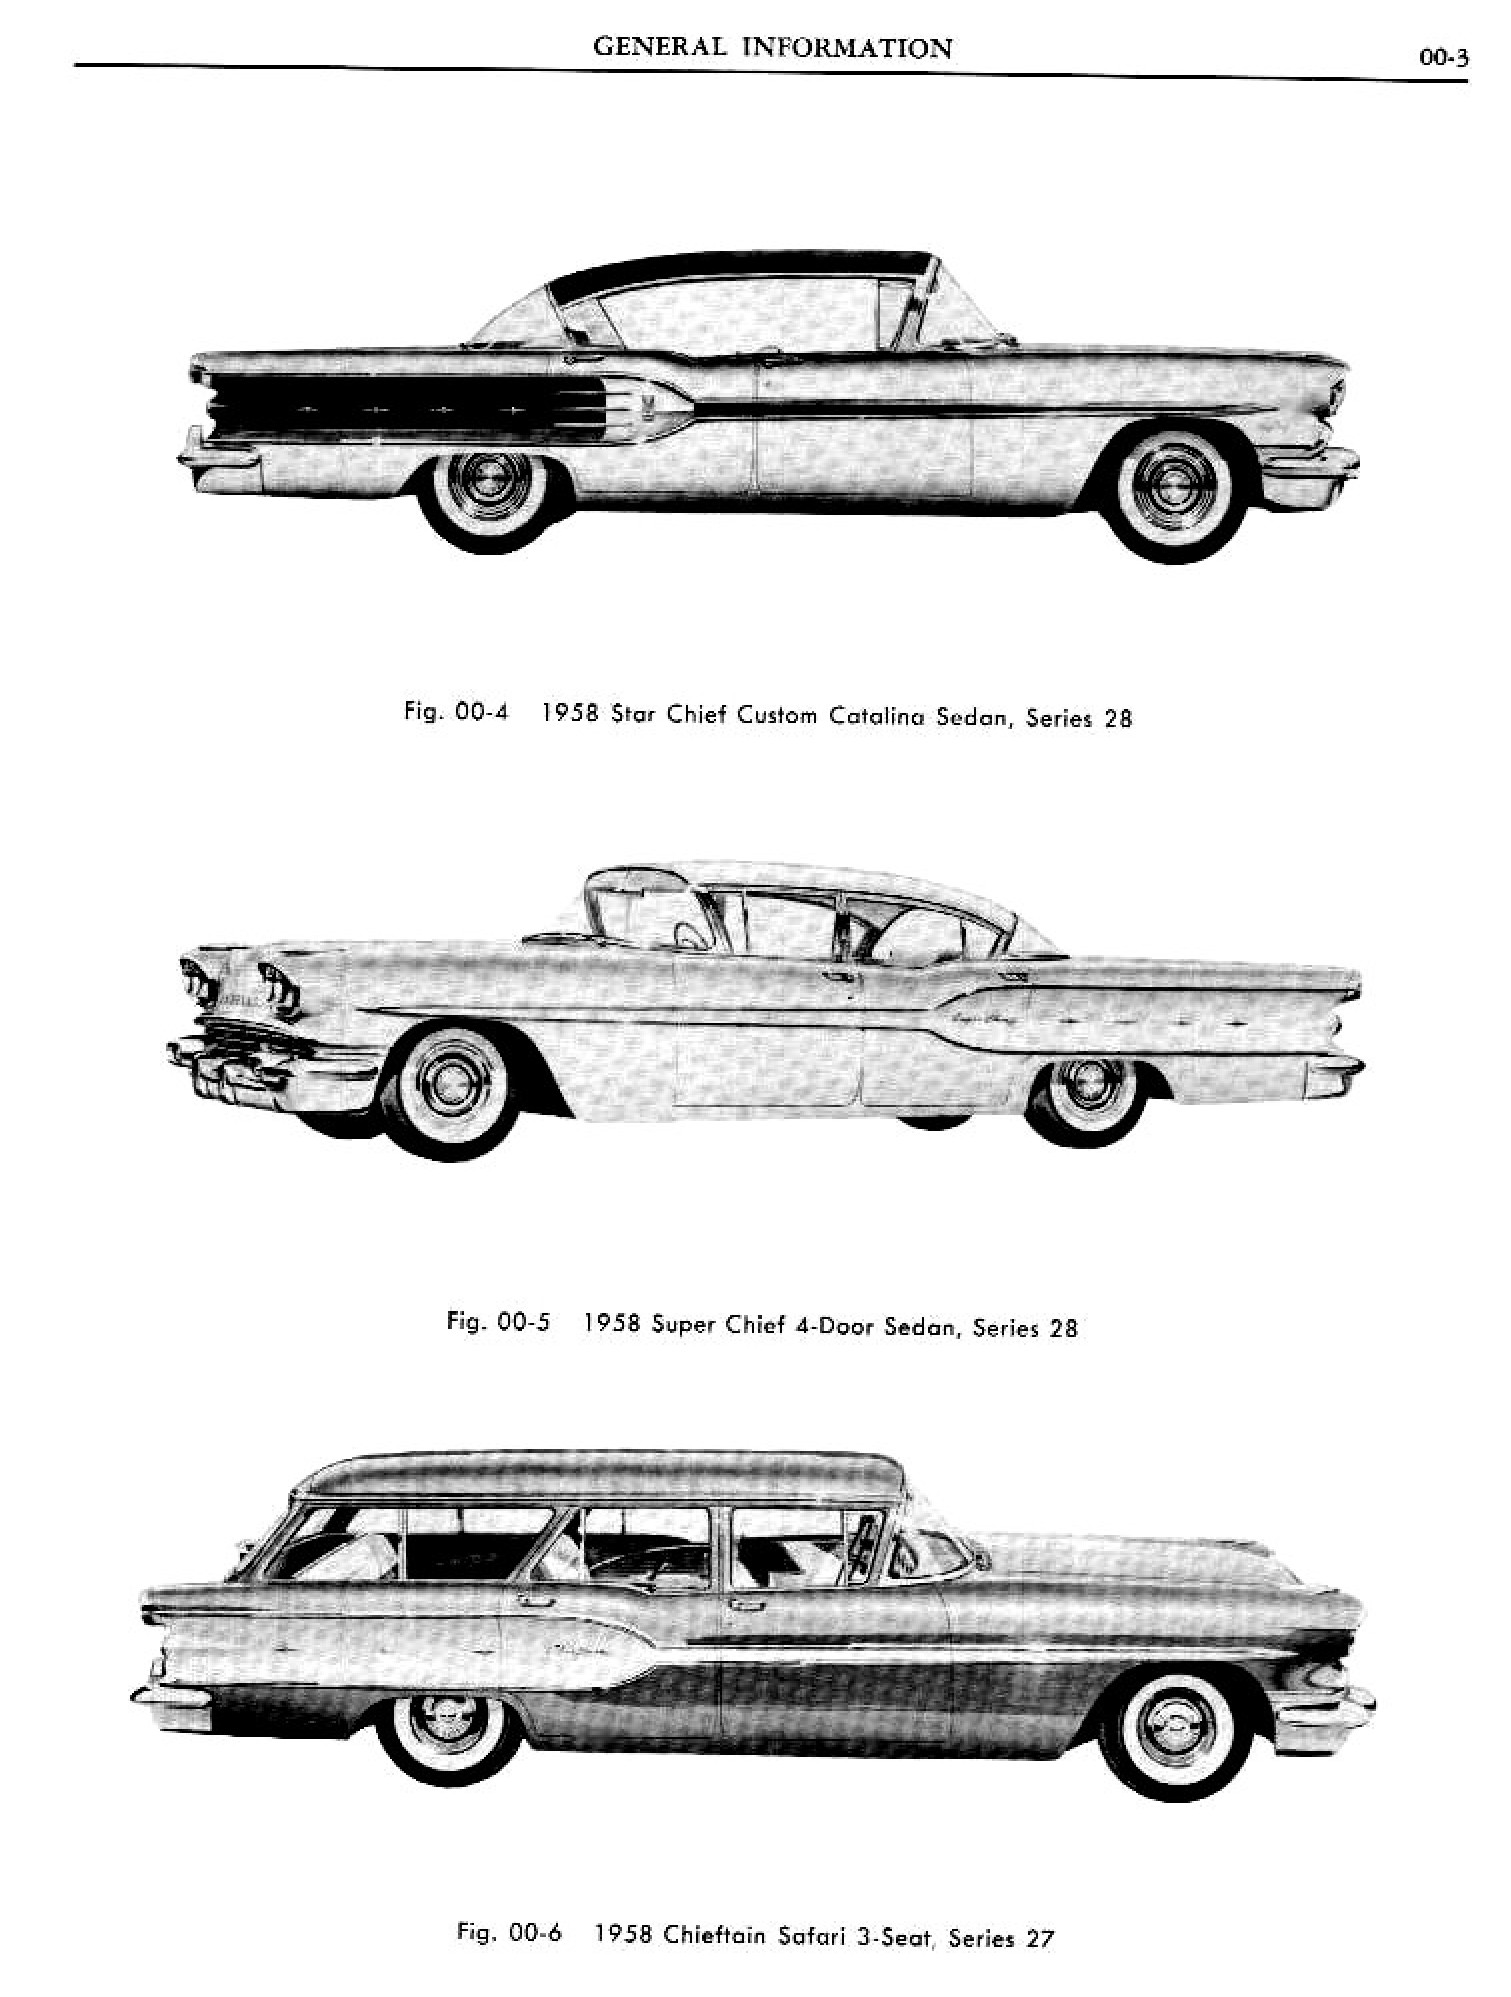 1958 Pontiac Shop Manual- Gen Information Page 4 of 7